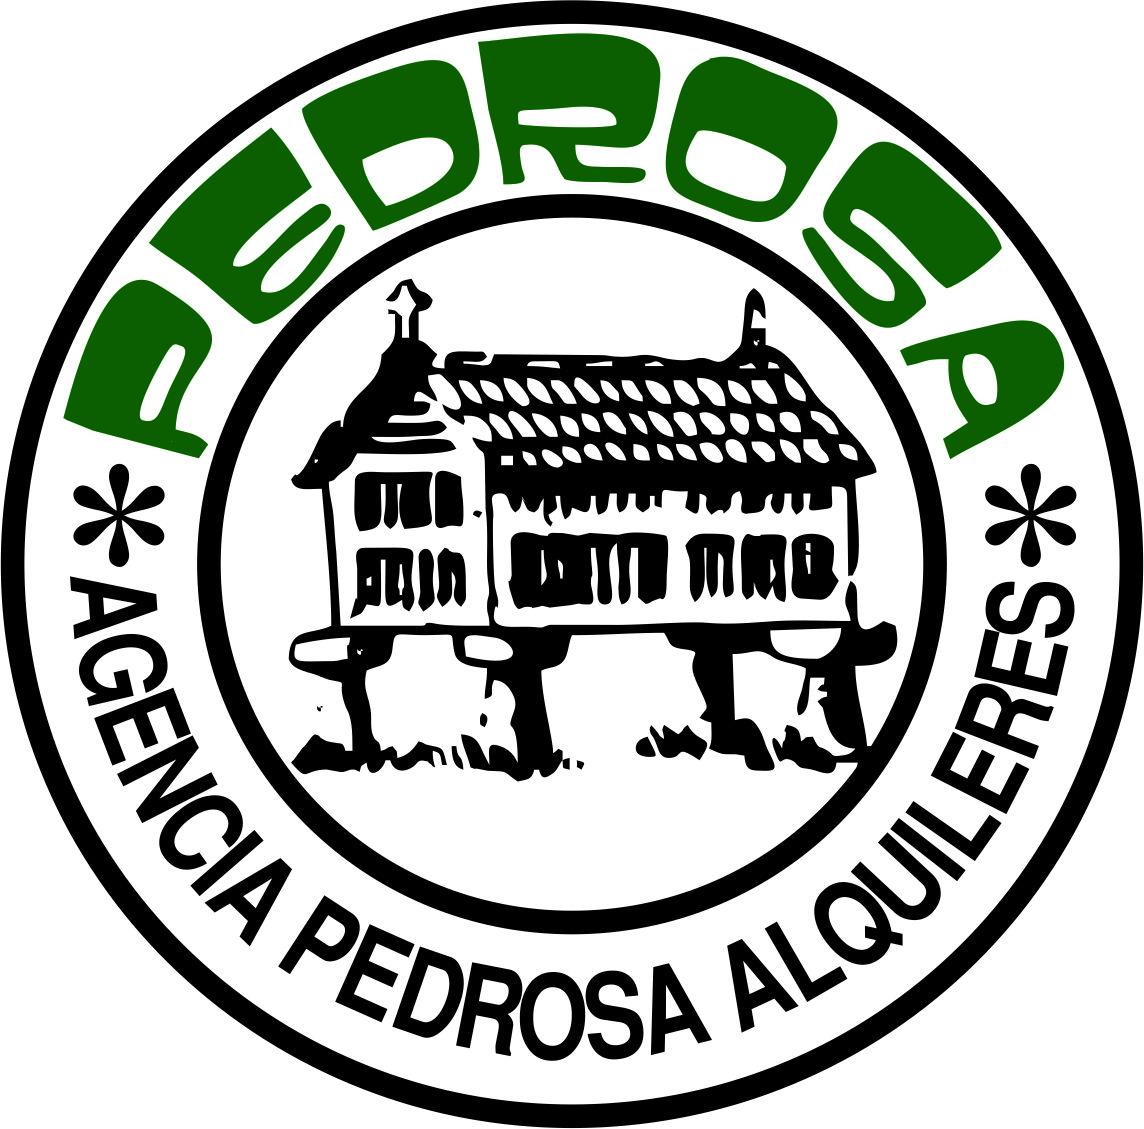 ACD A SECA Inmobiliaria Pedrosa